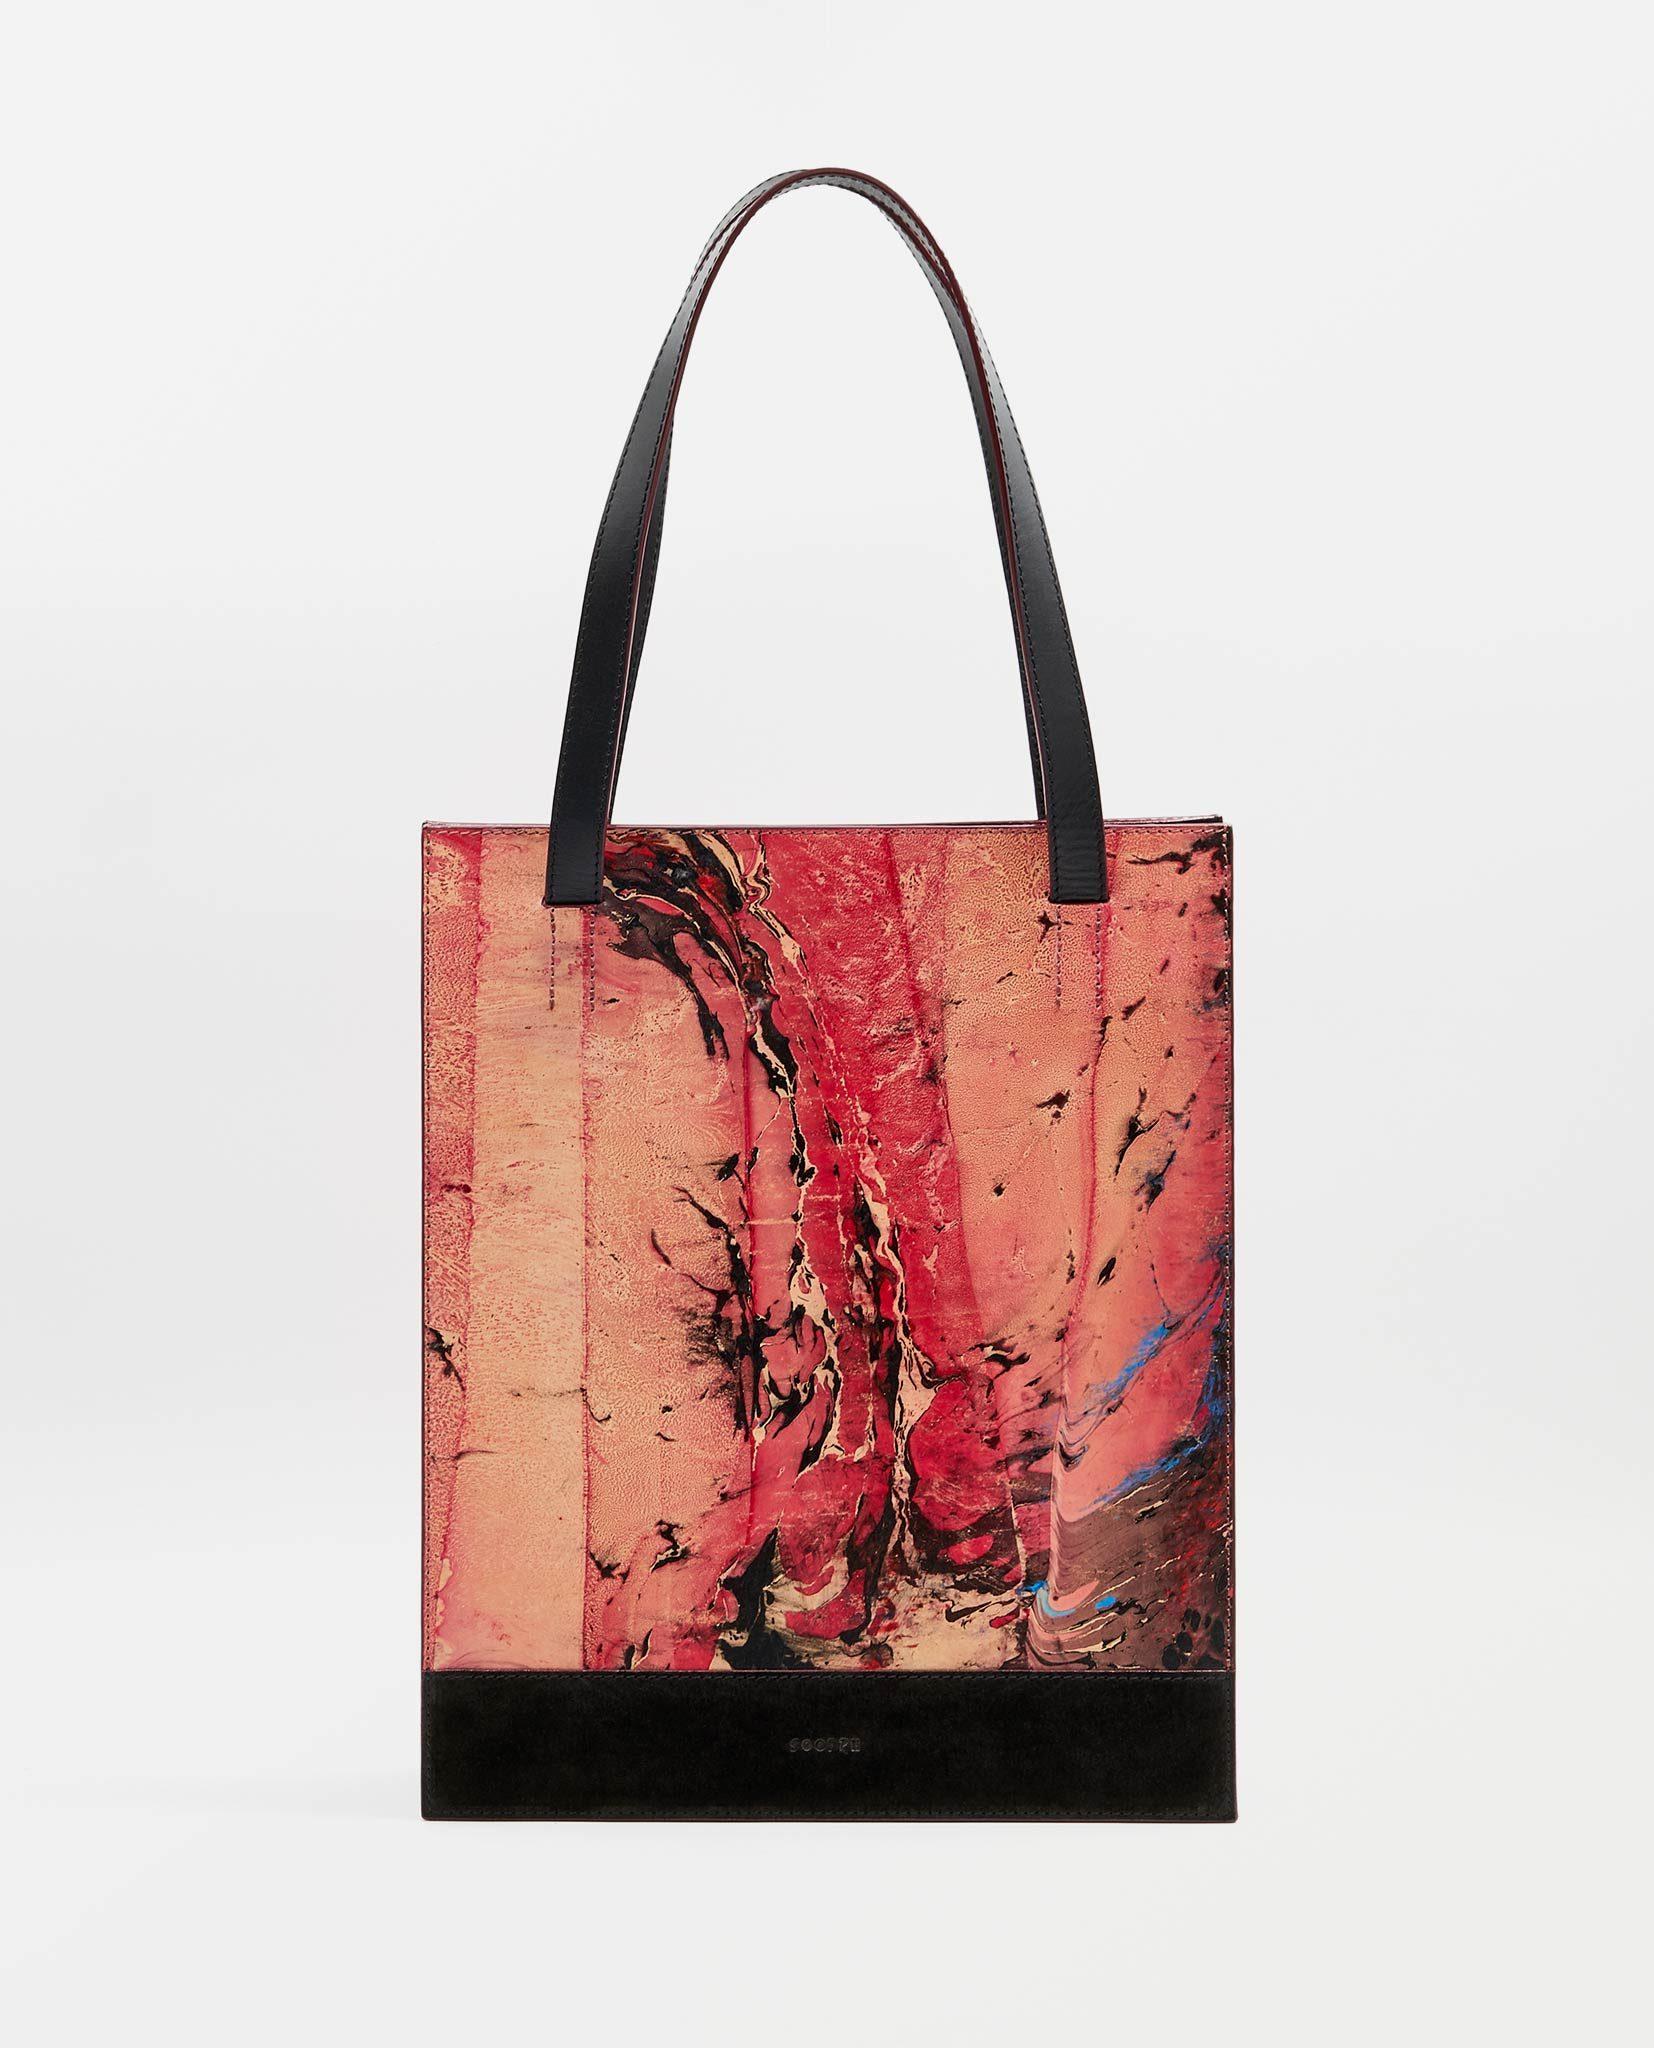 SOOFRE-Berlin-unique-Shopper-Bag-marble-red-black-FRONT